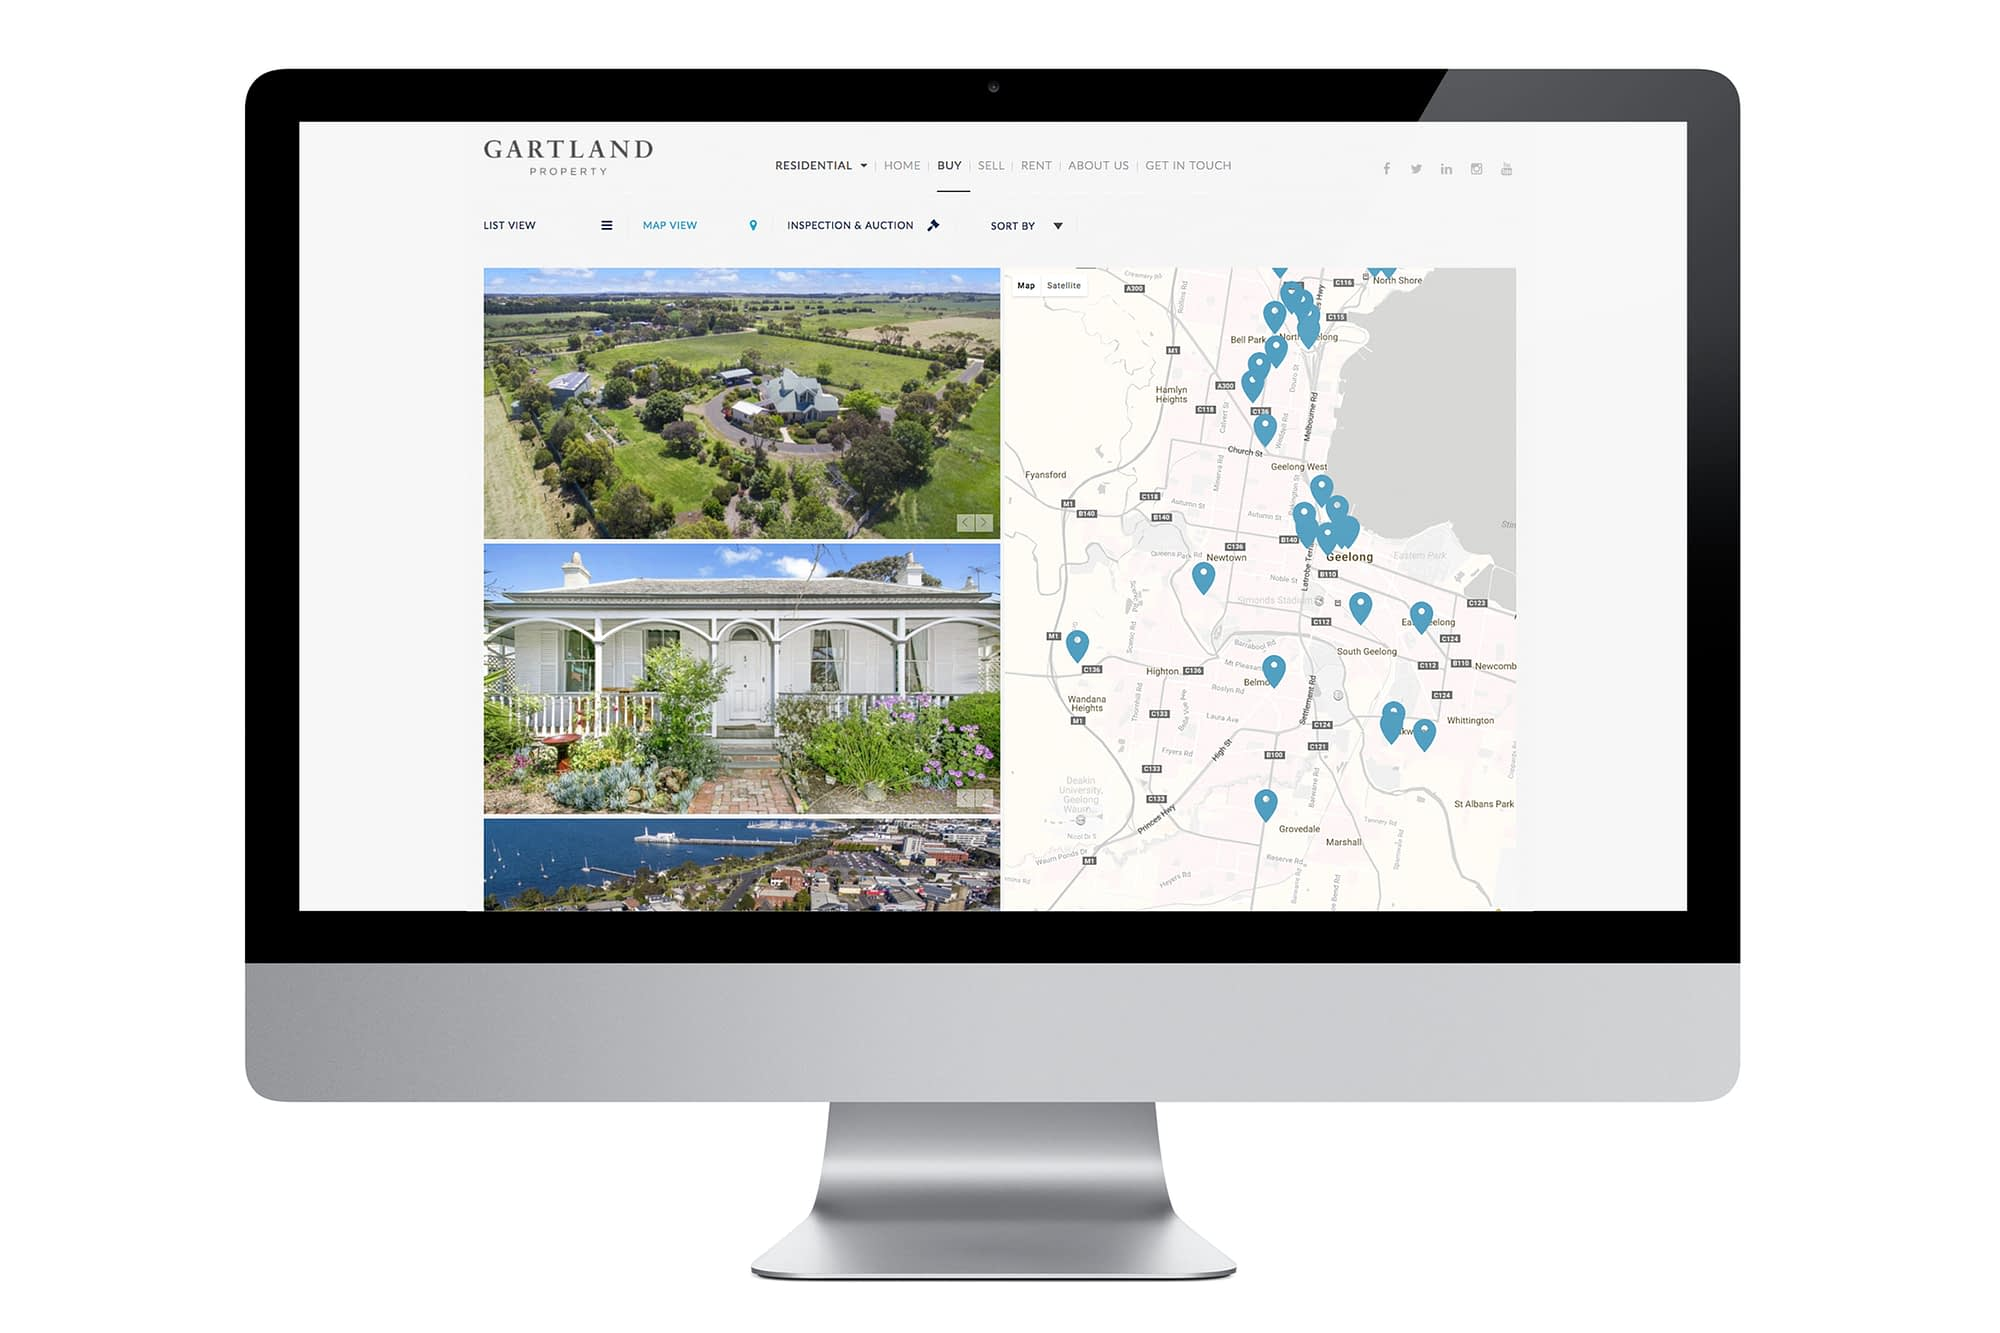 Gartland website Buy Property page